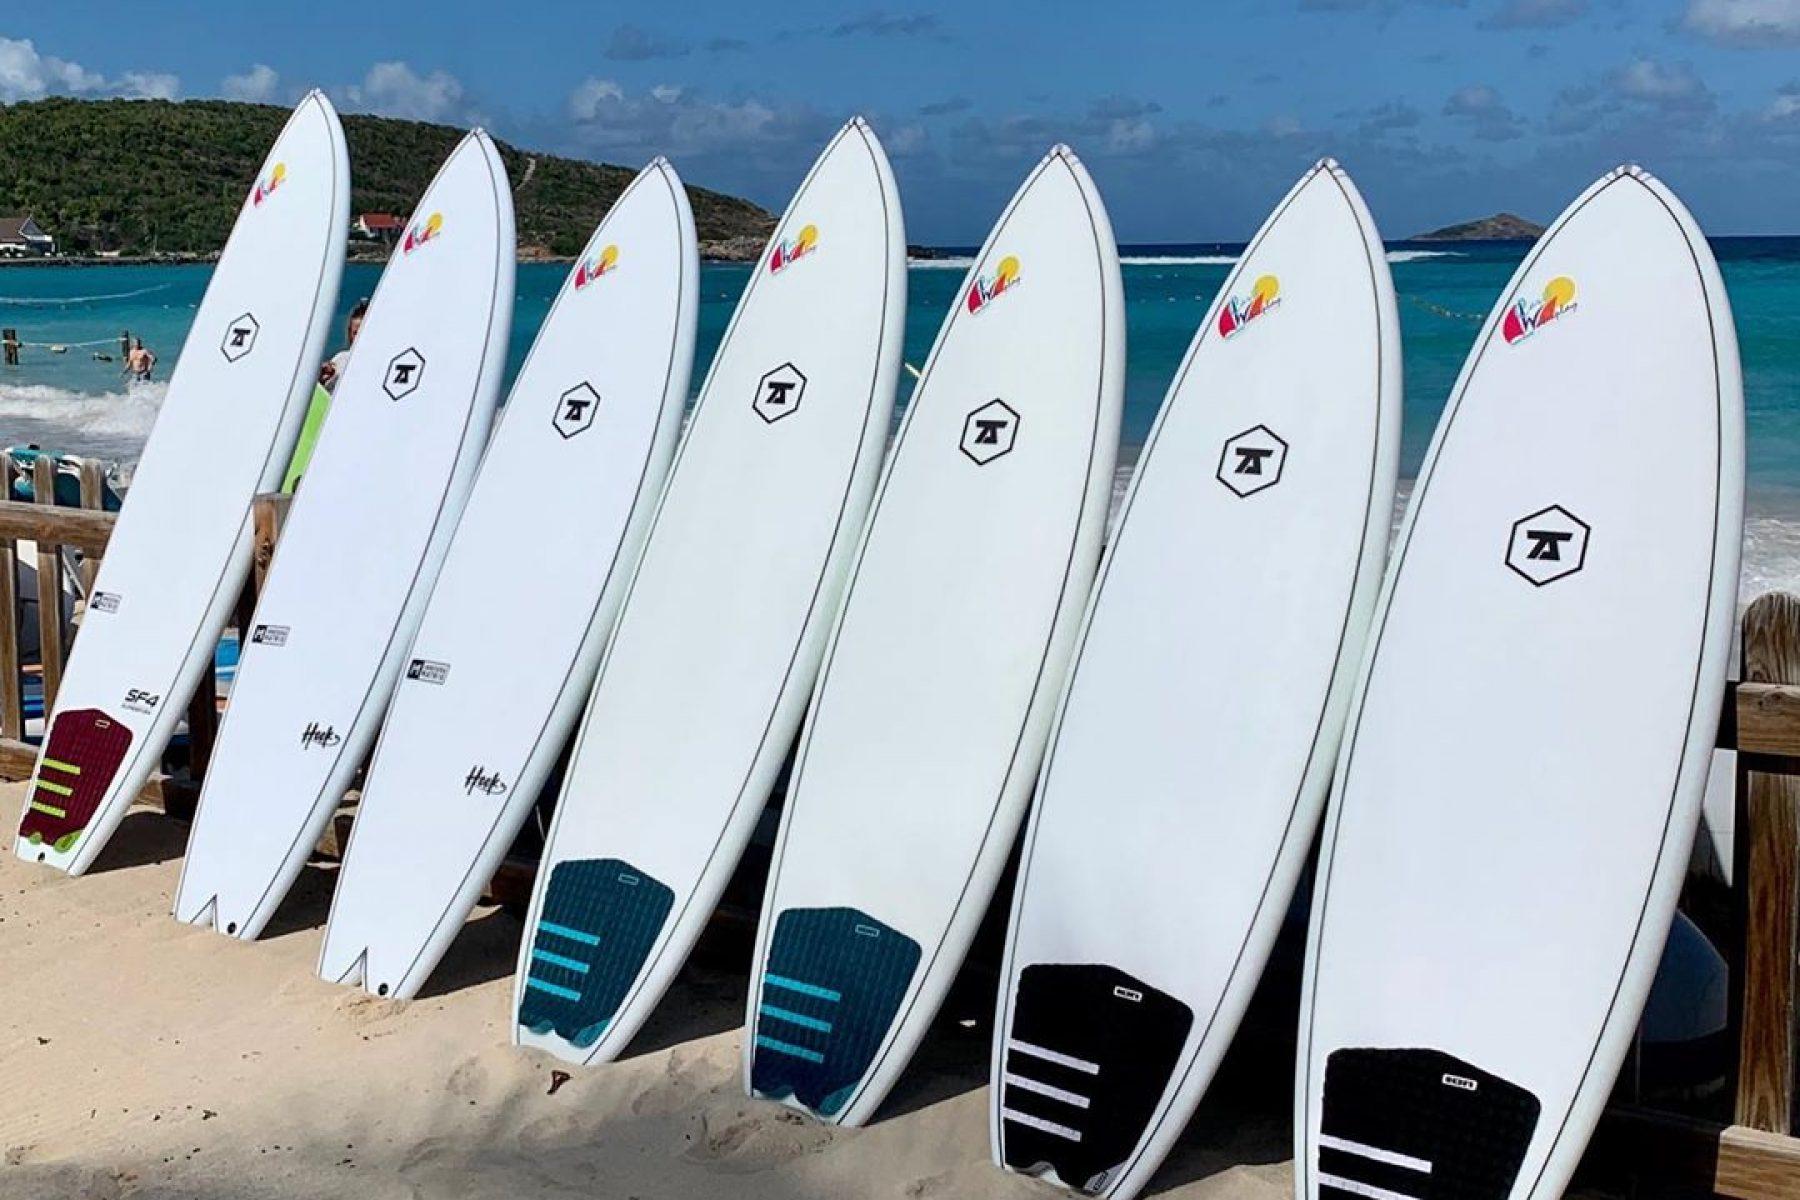 Surf Beach in St Barts